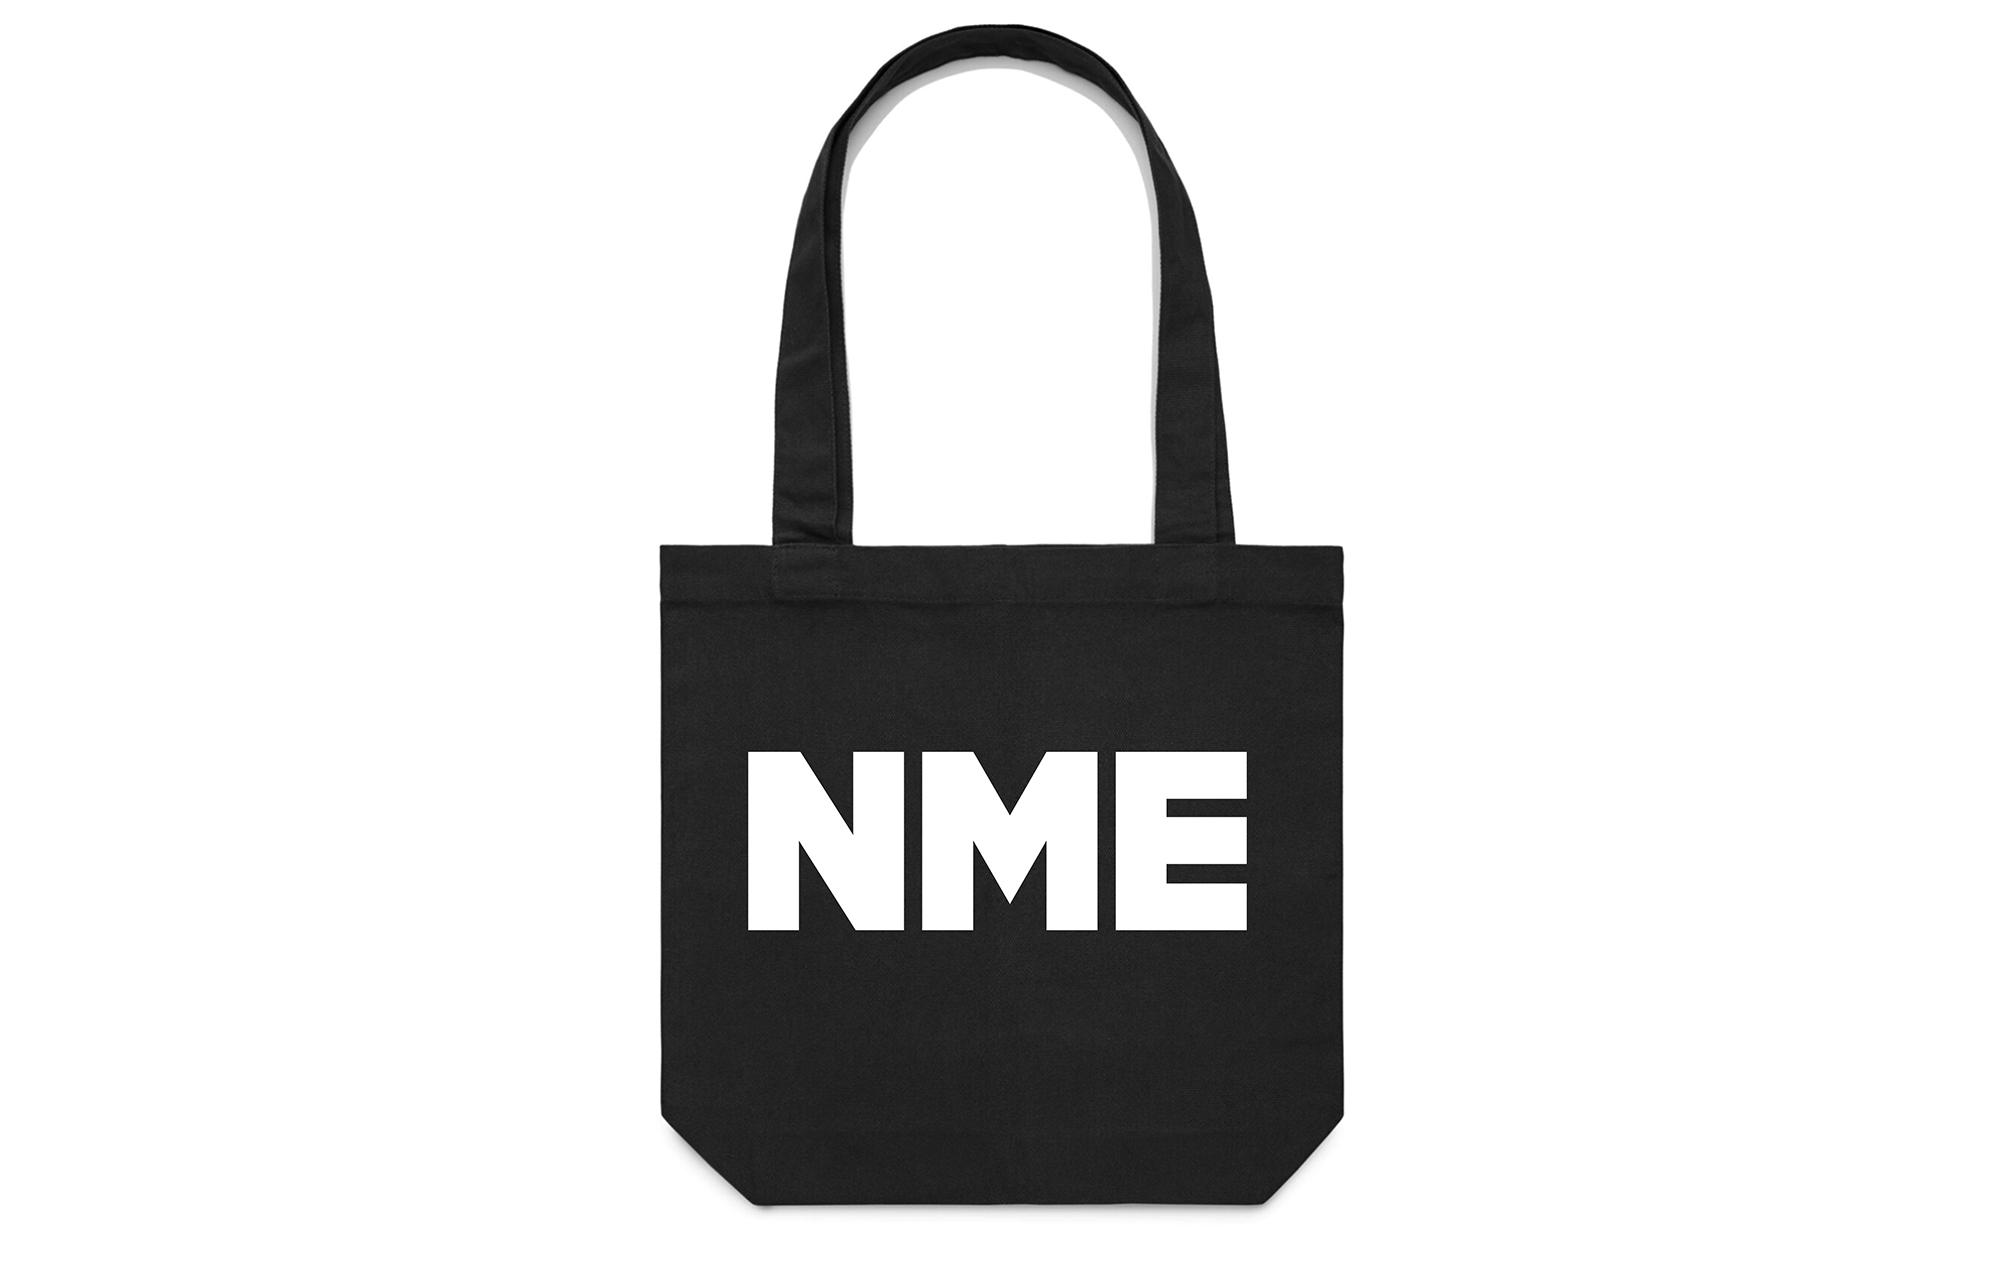 nme tote bag merch